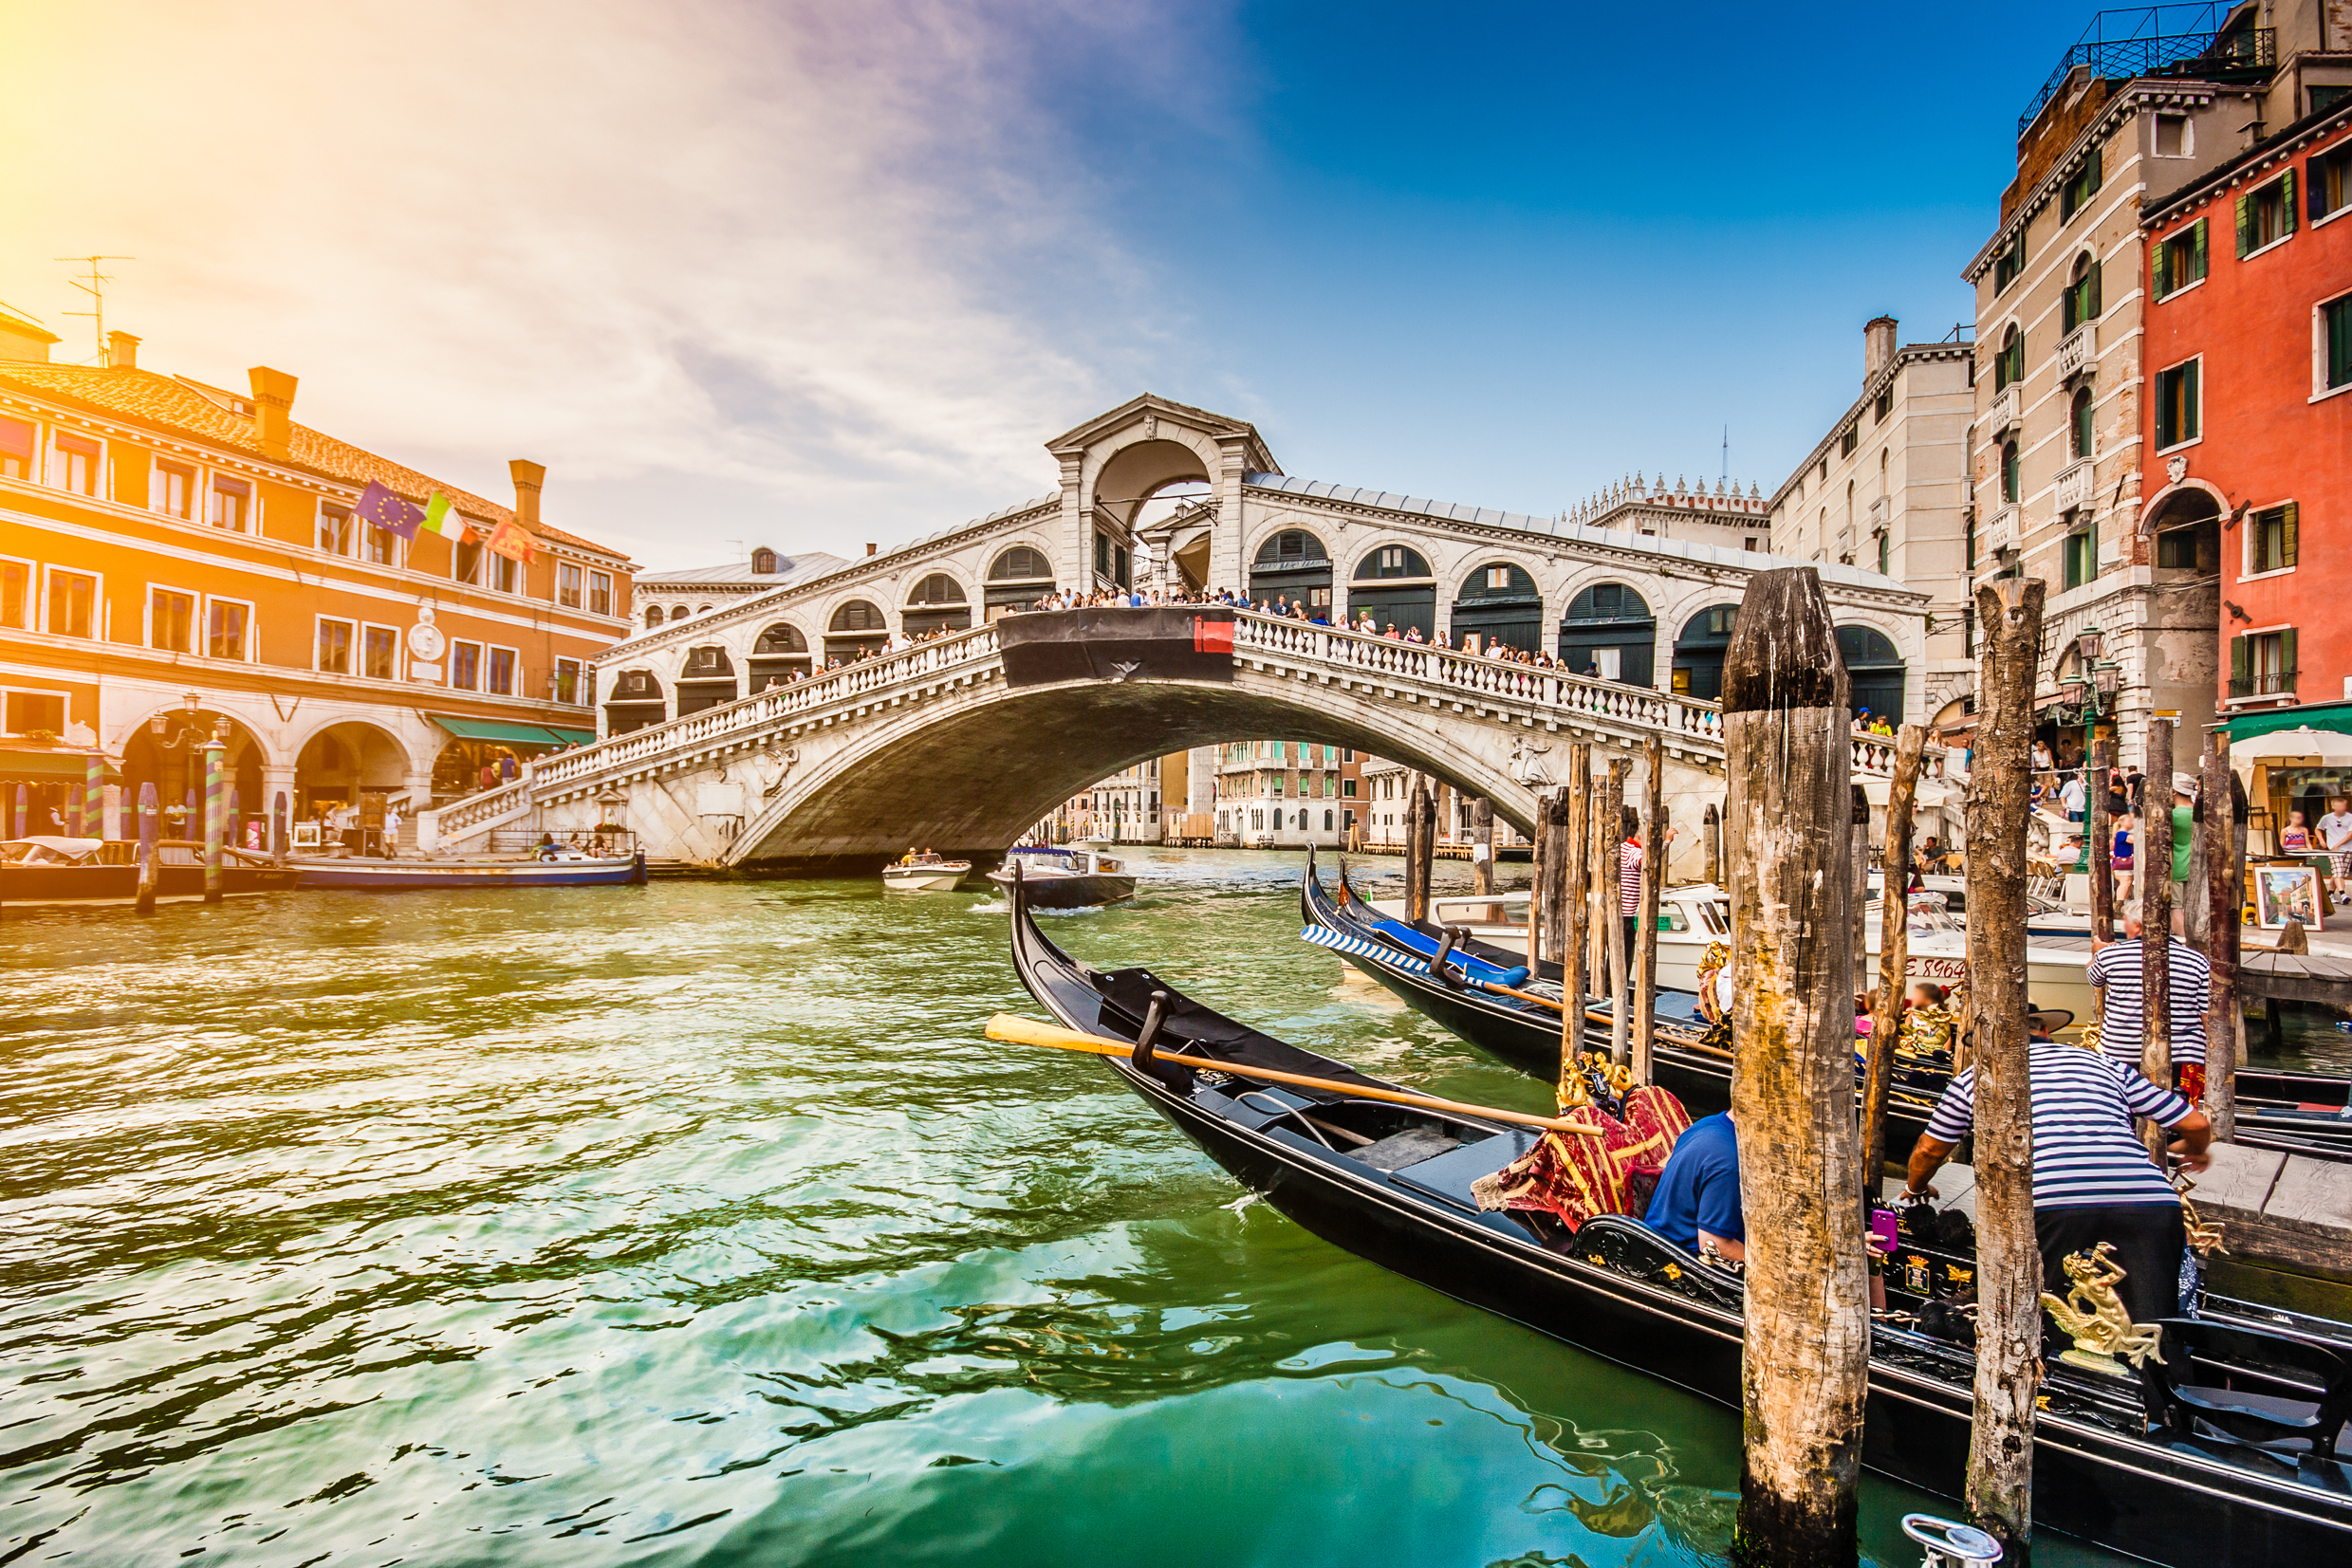 Niente traffico in vacanza: 9 città in cui rilassarsi senza